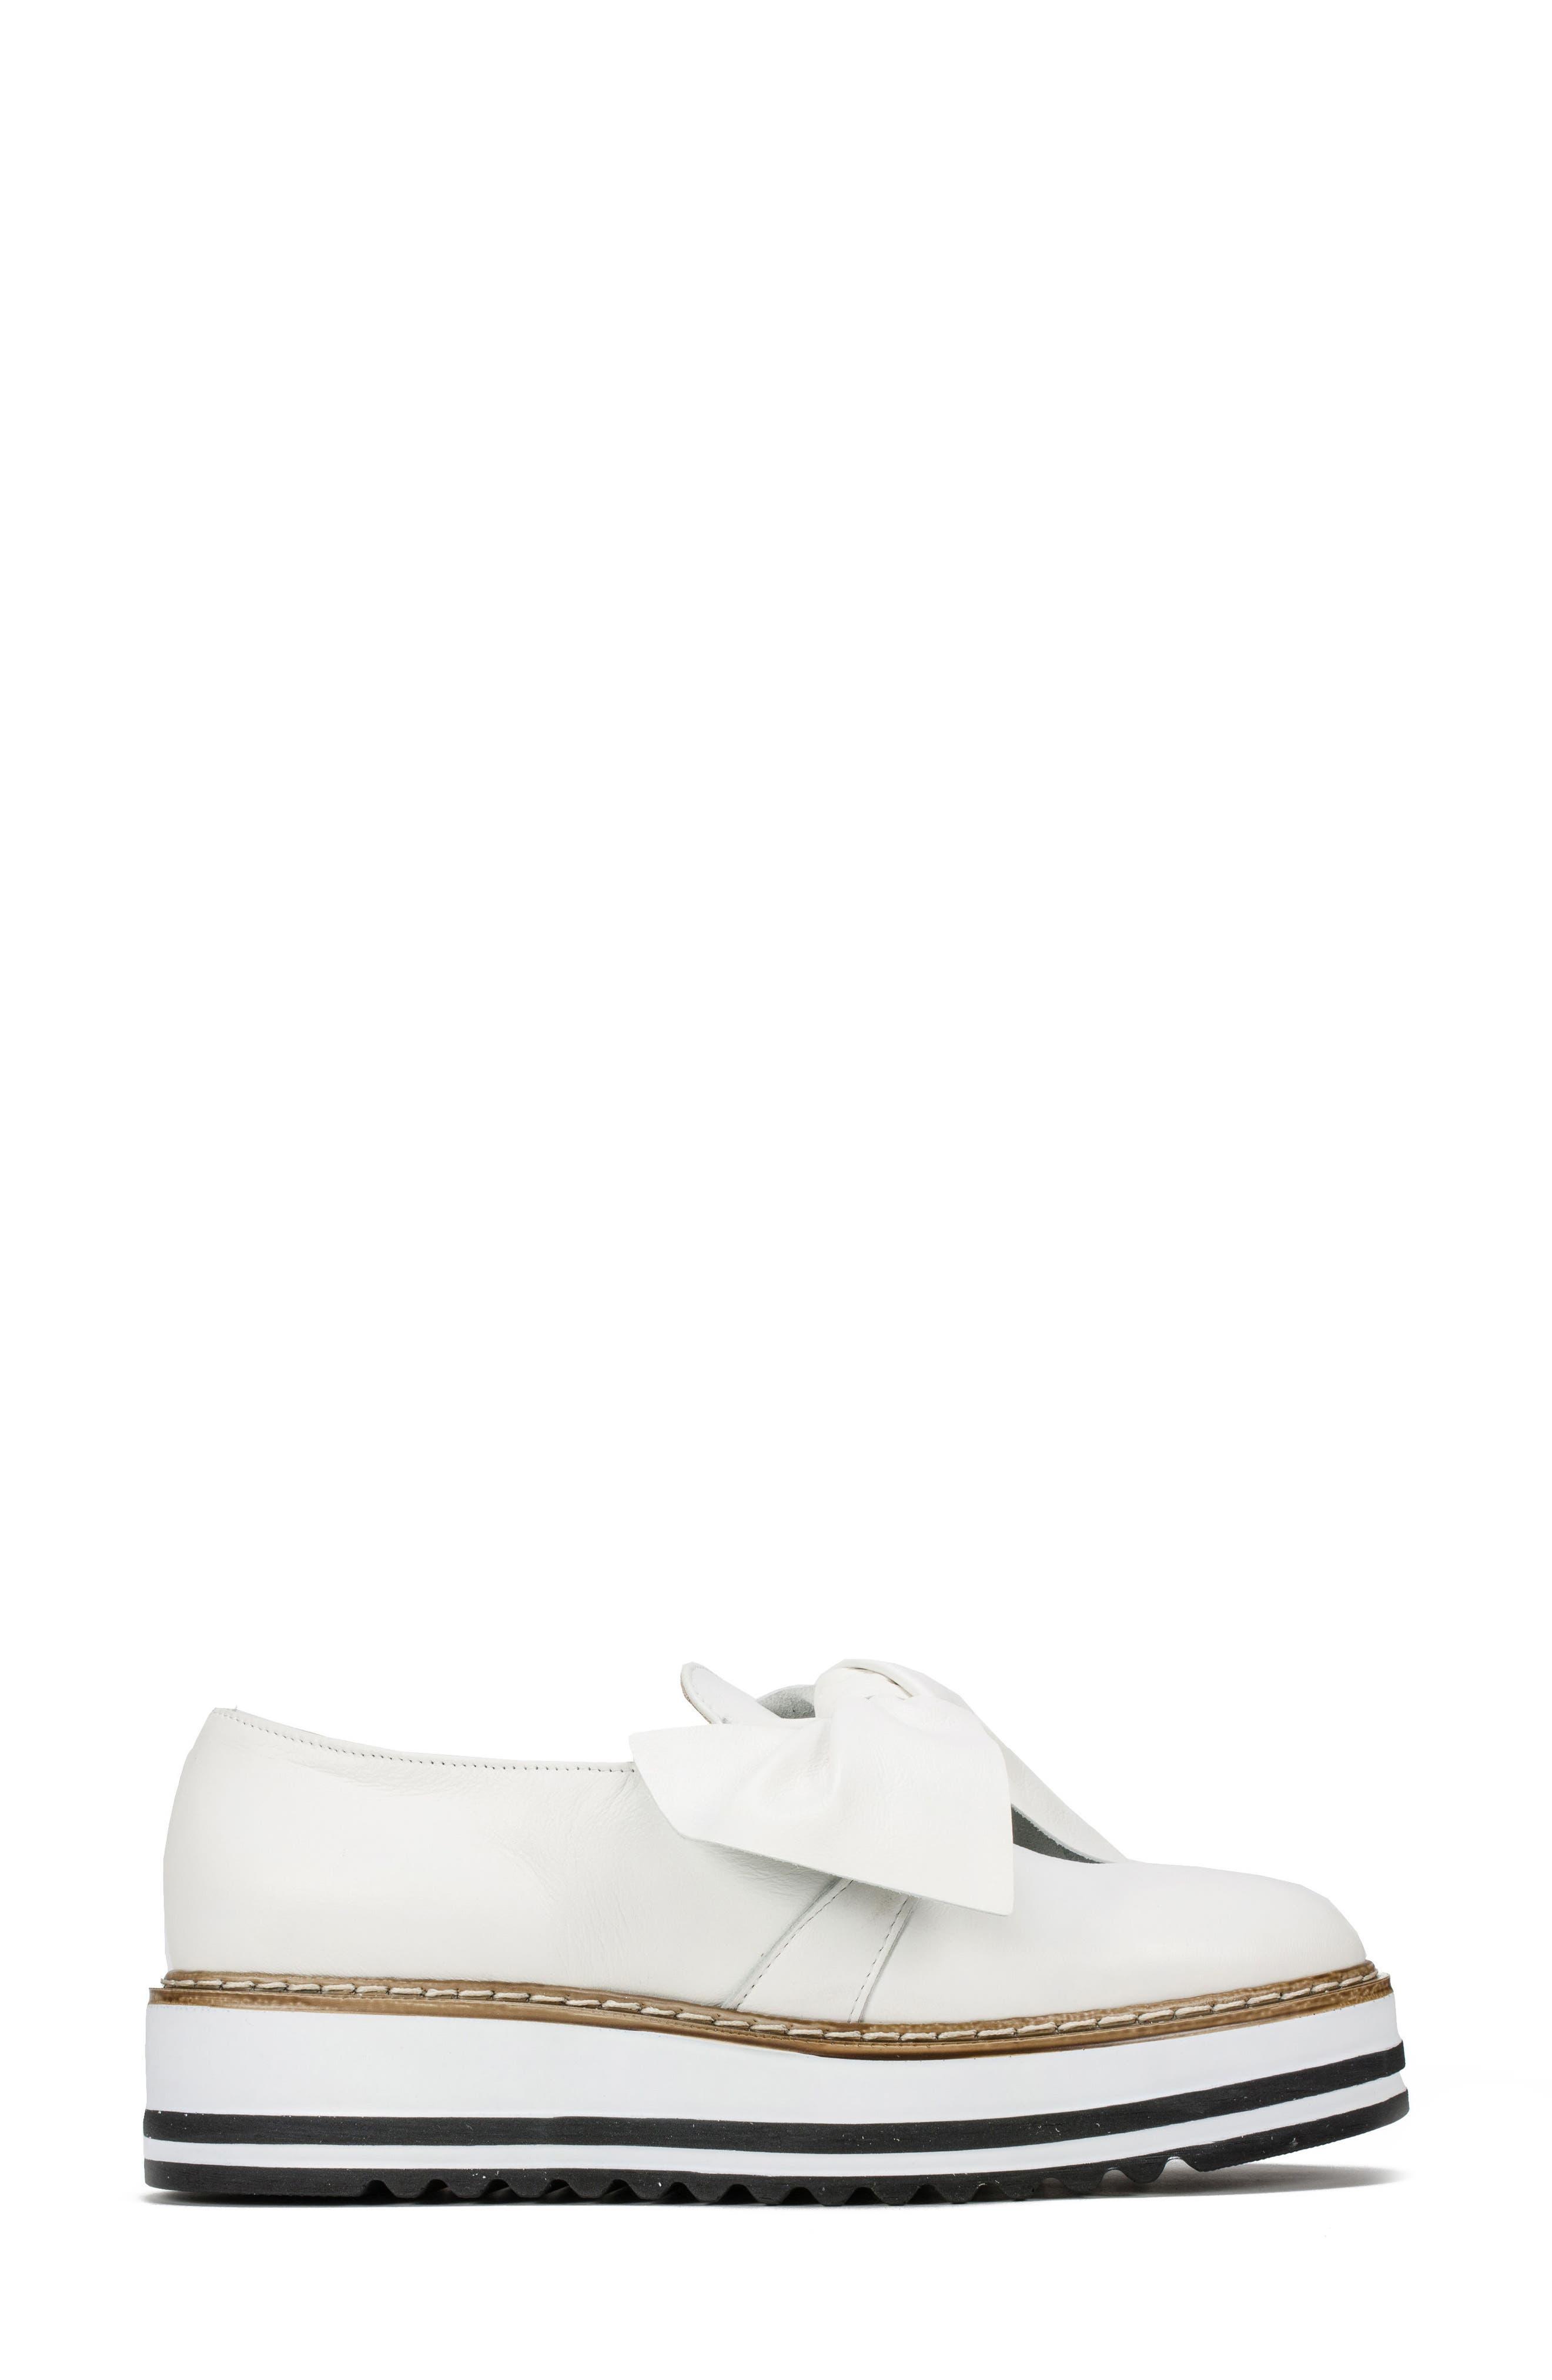 Bella Platform Loafer,                             Alternate thumbnail 3, color,                             WHITE LEATHER